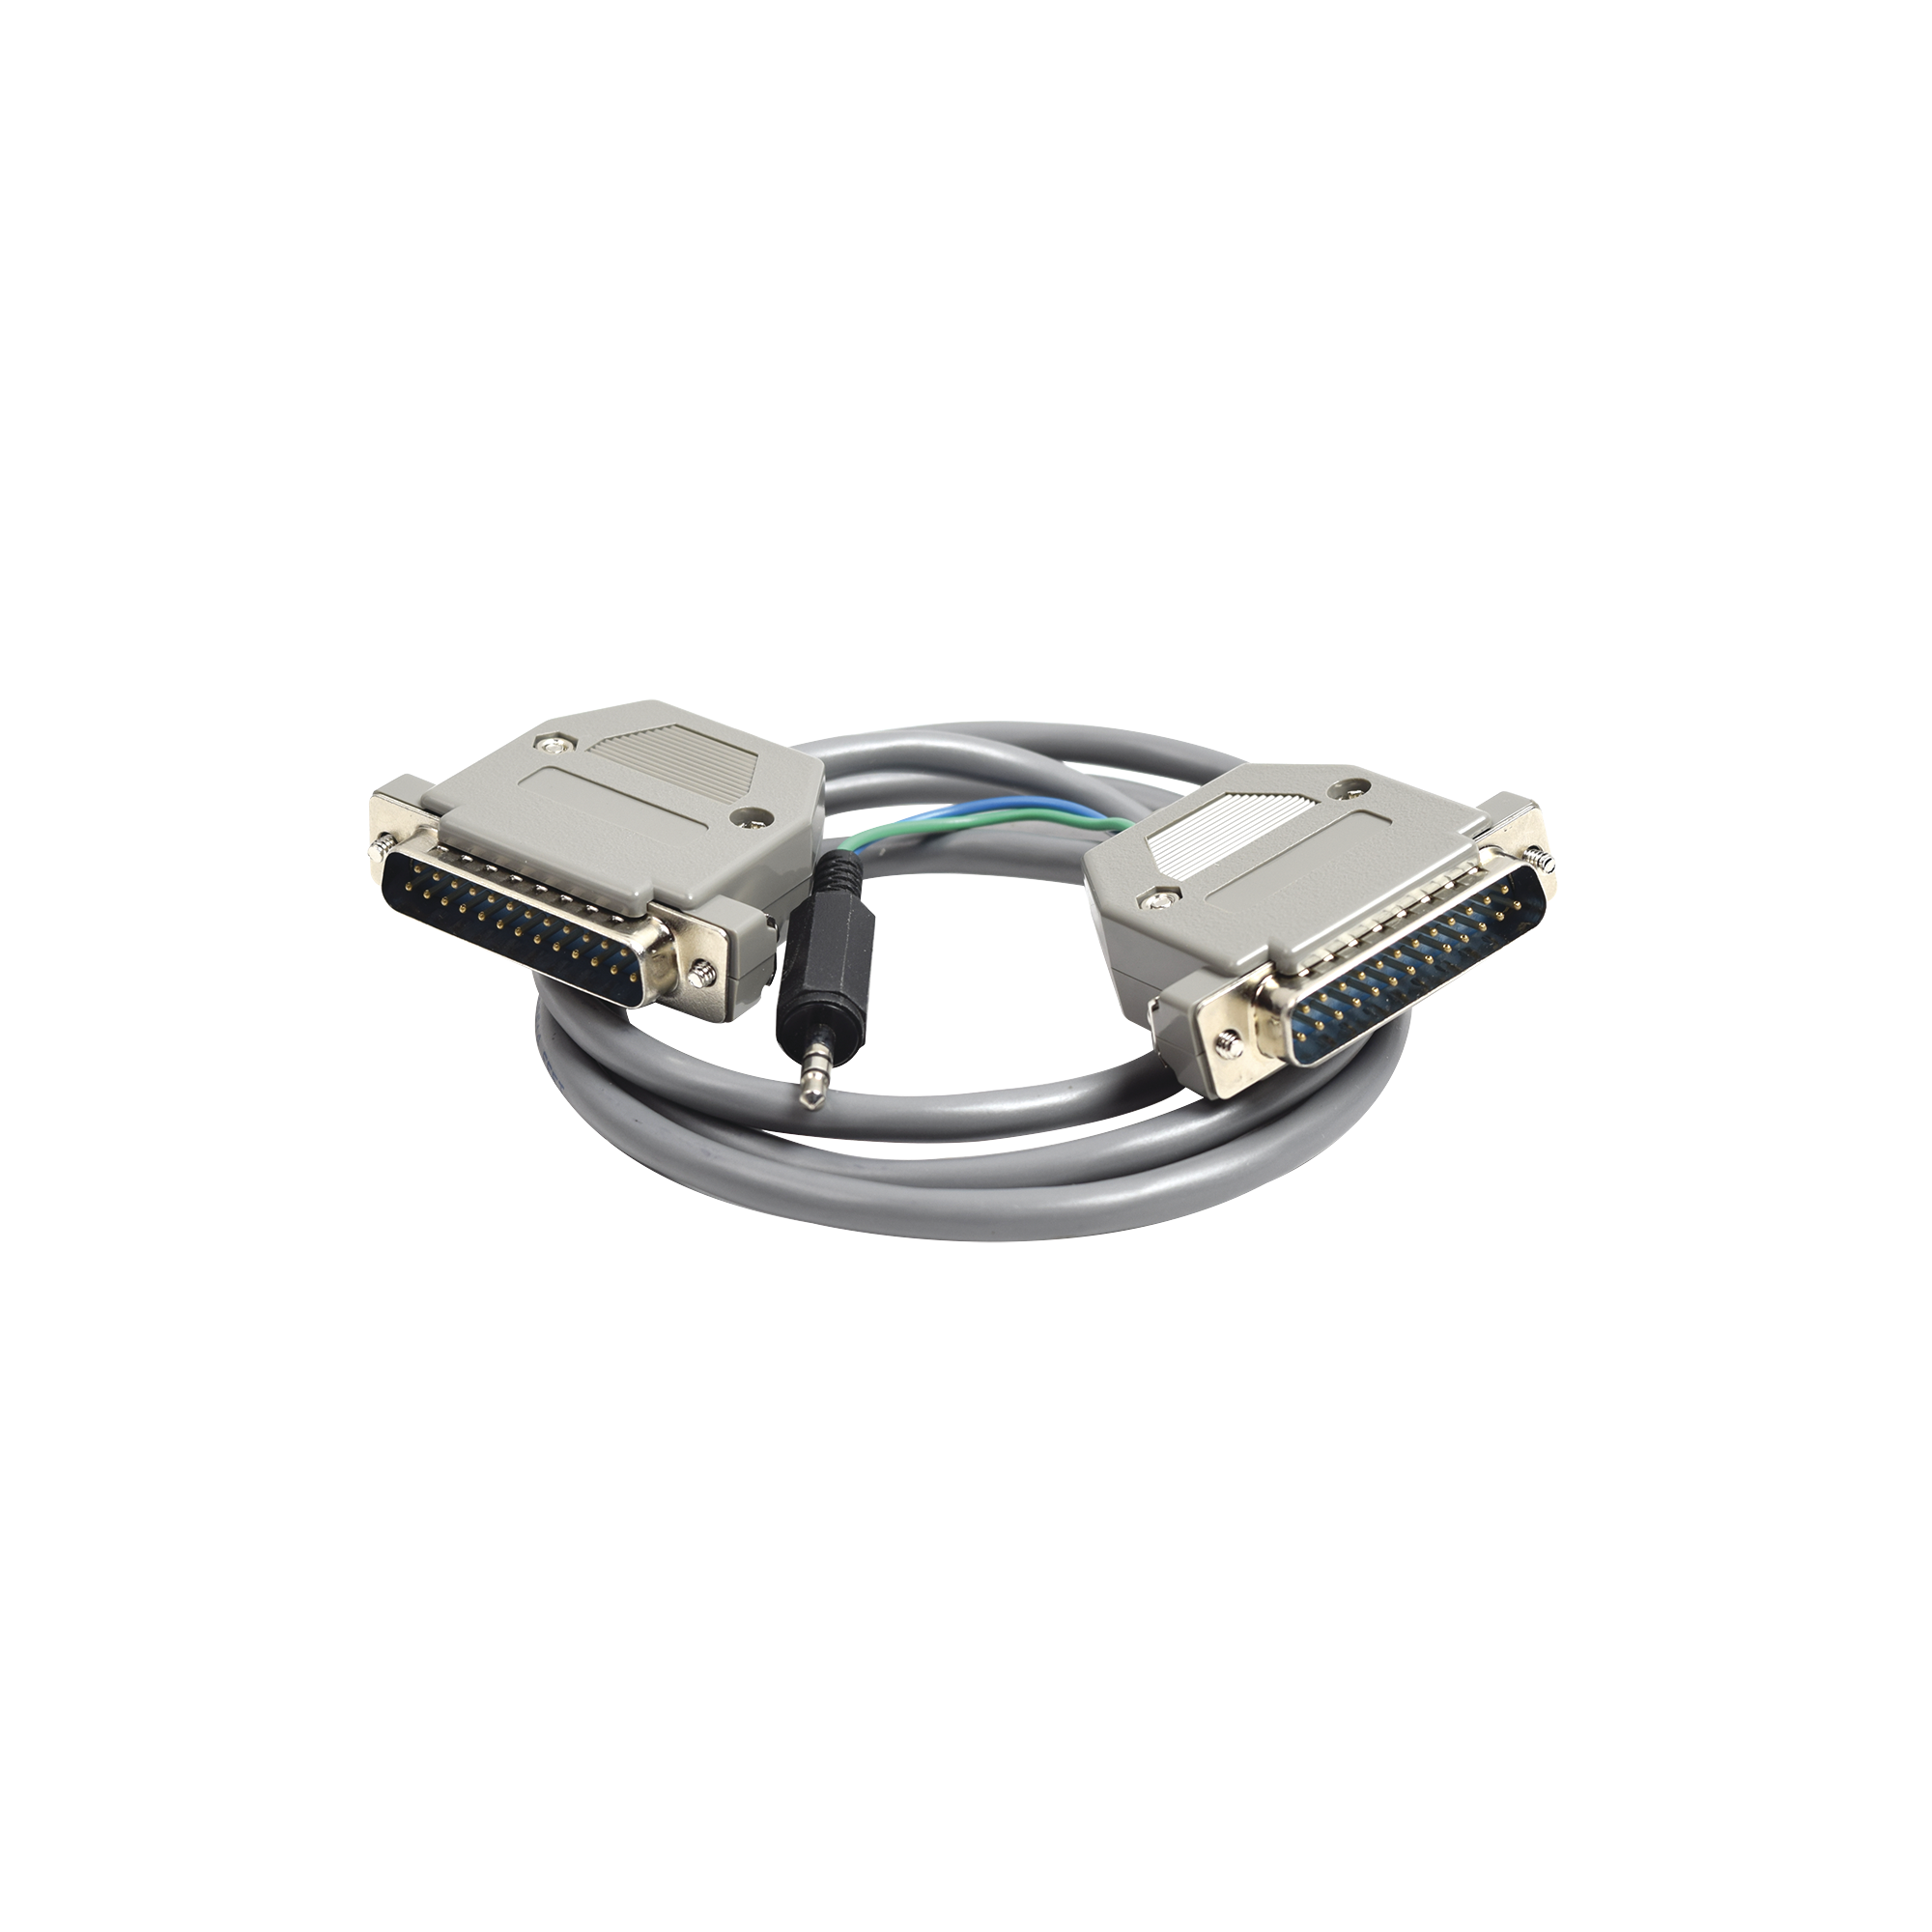 Arnés para Interconexión de Radio NX700/800 a Repetidor NXR700/800.